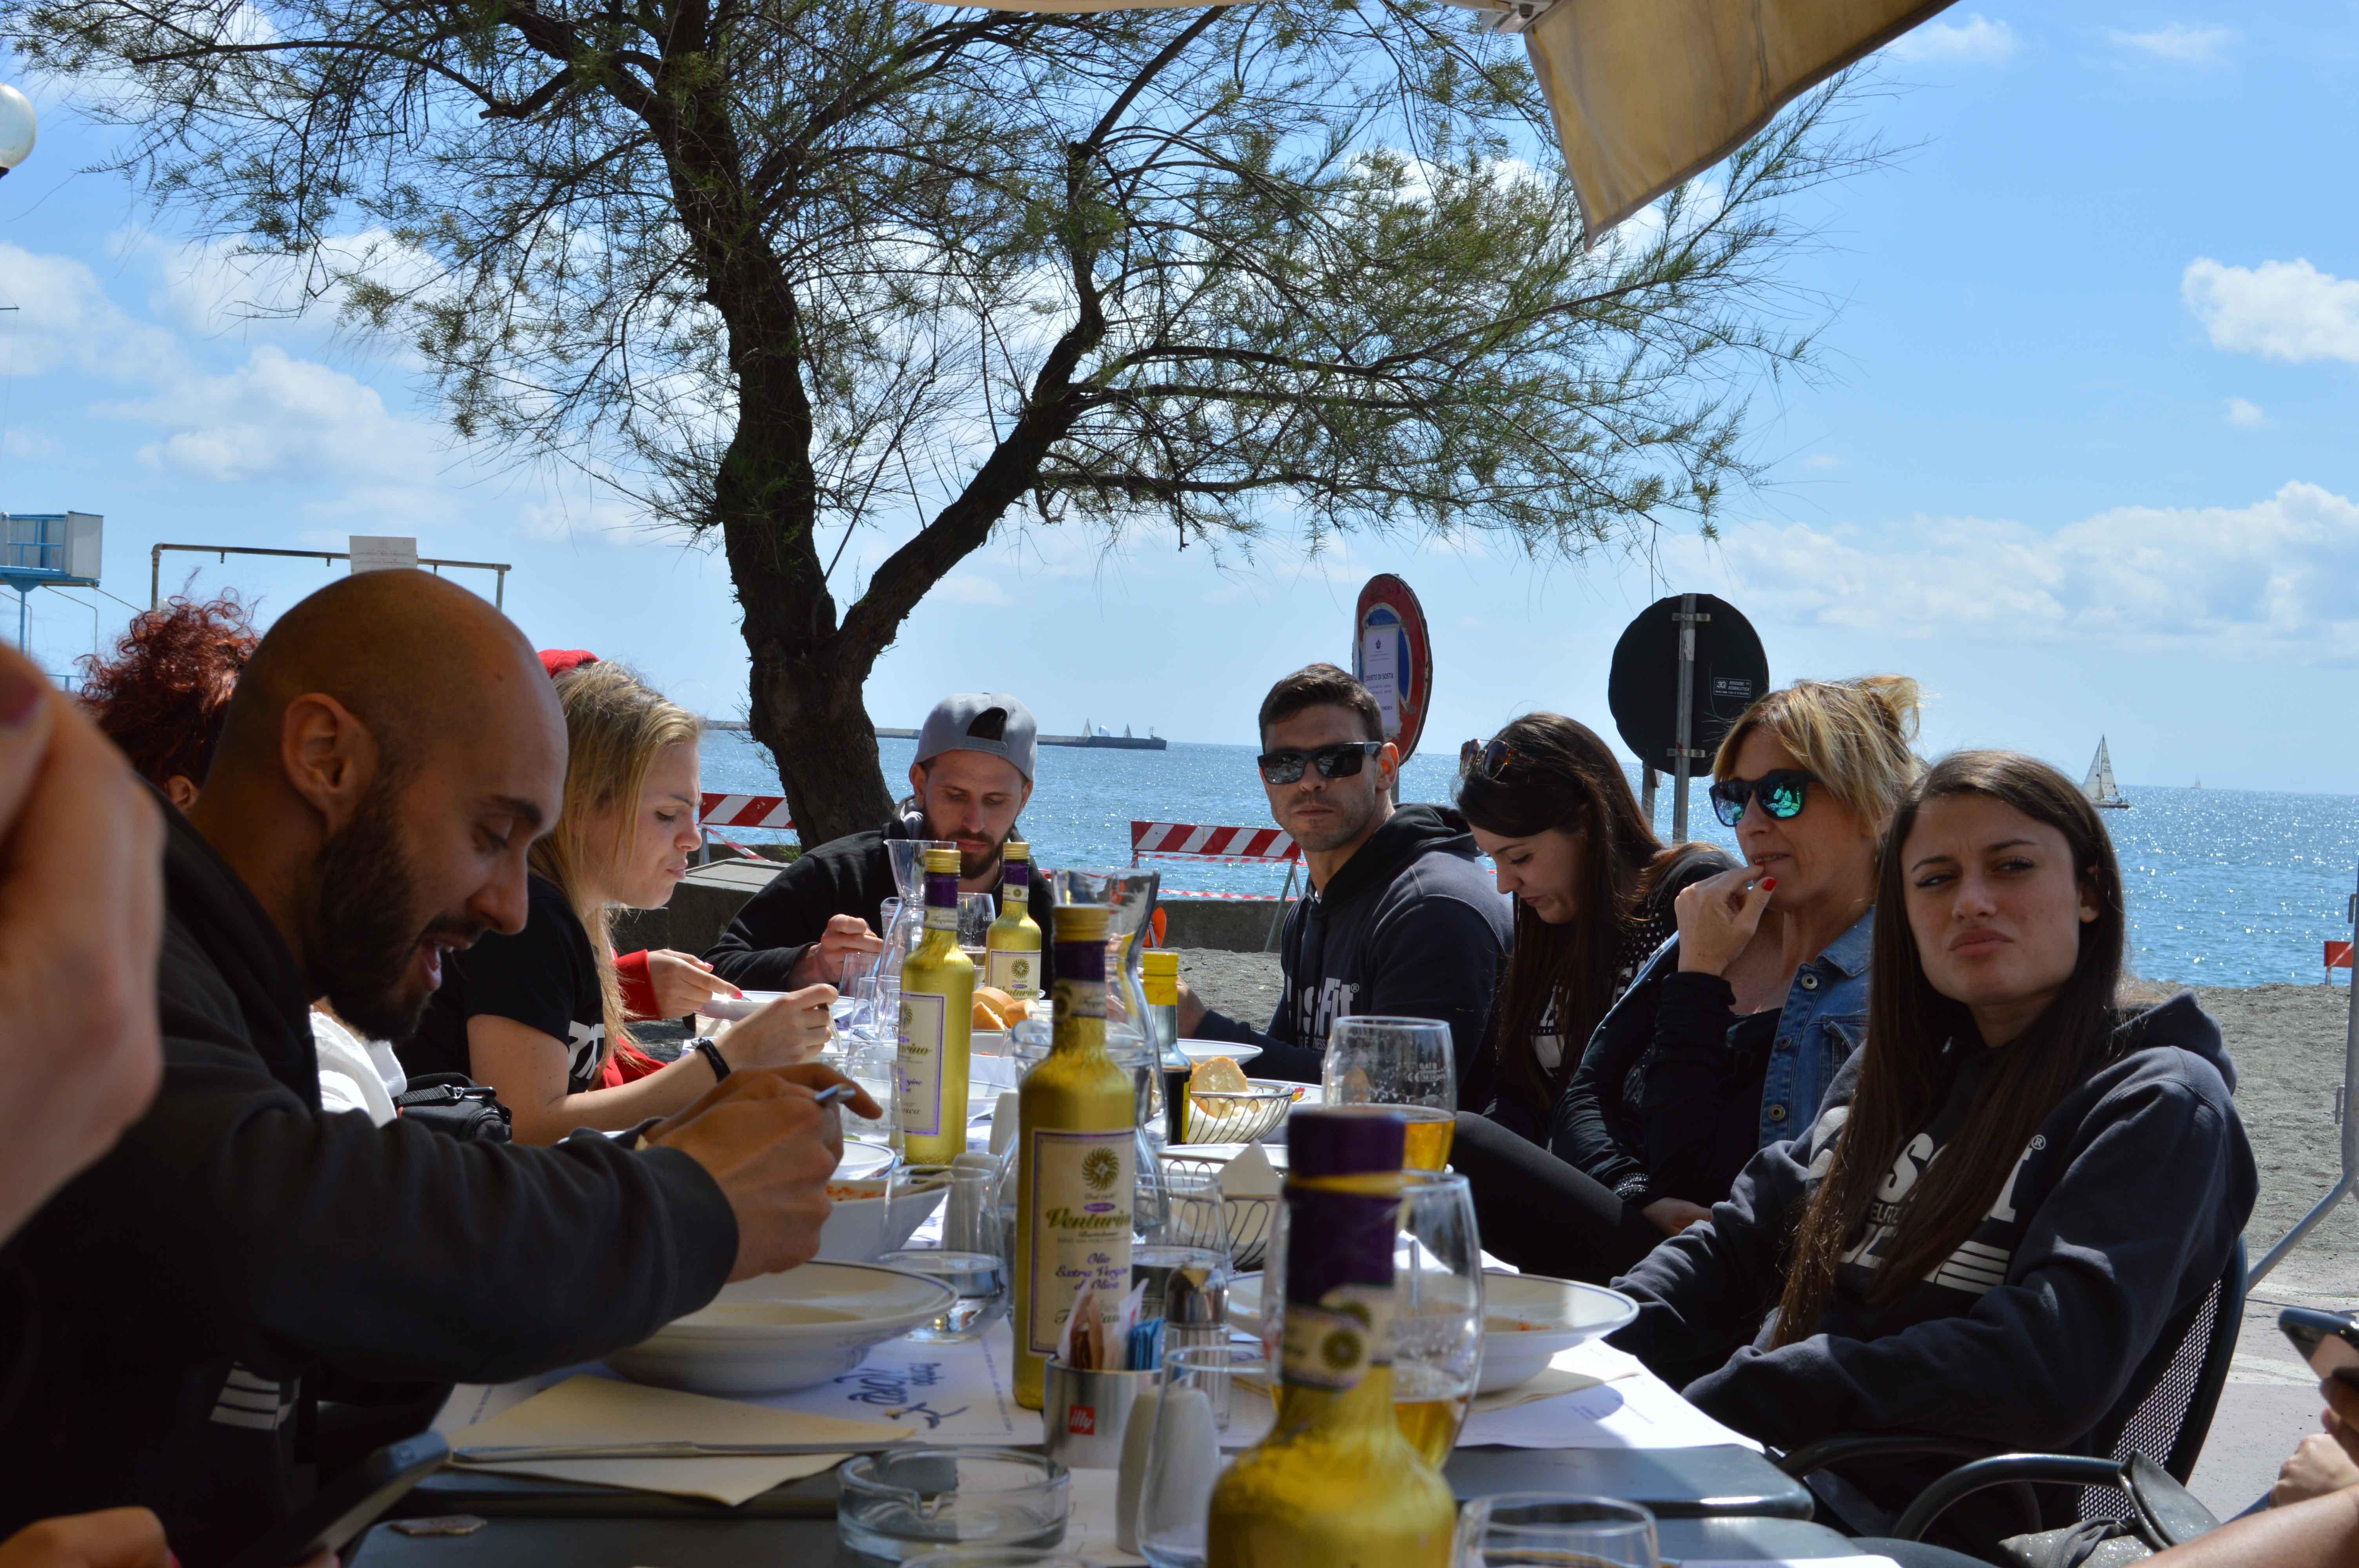 pranzo-crossfit-in-riva-al-mare-genova